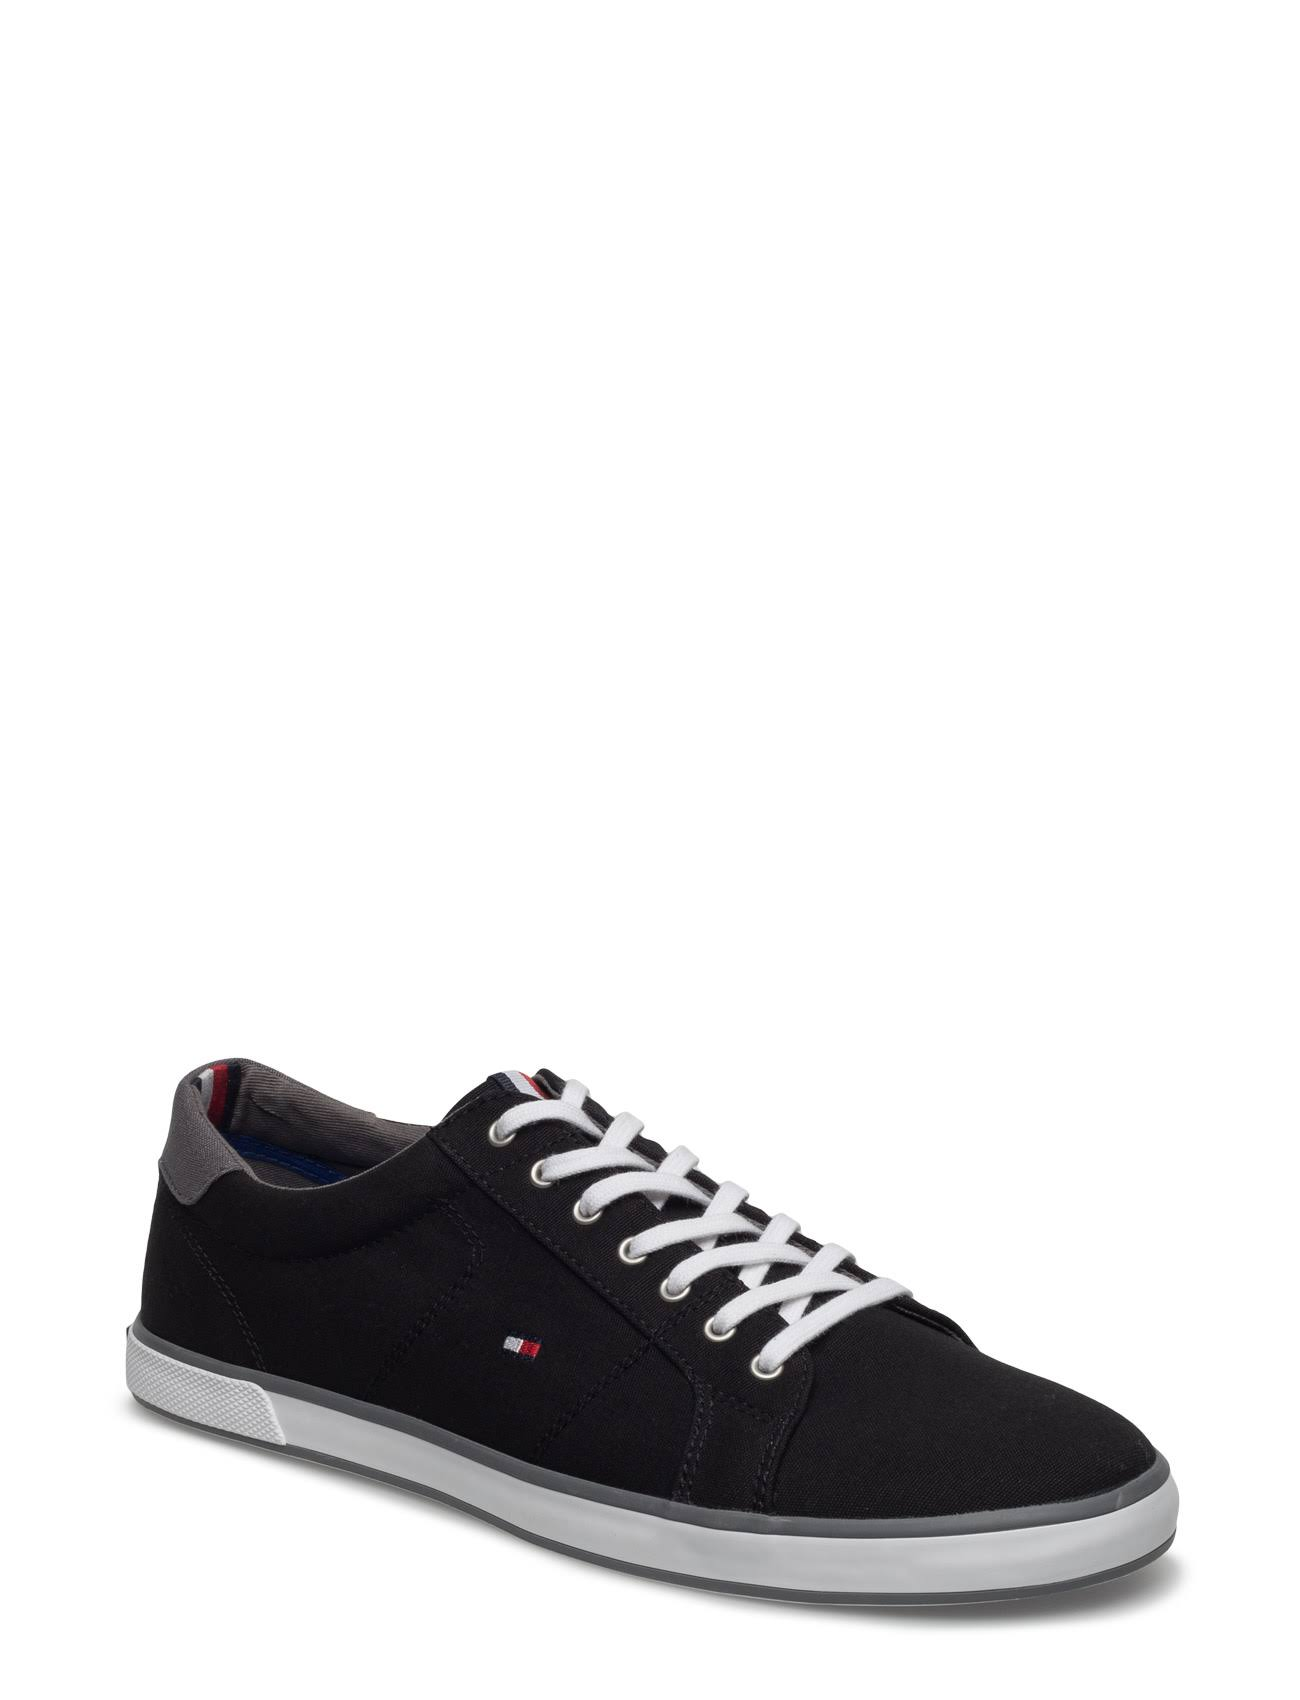 Tommy Sneakers Harlow Hilfiger Sneakers Harlow NeroTaglia42NeroTessuto NeroTaglia42NeroTessuto Tommy Hilfiger 4jqSc5AR3L